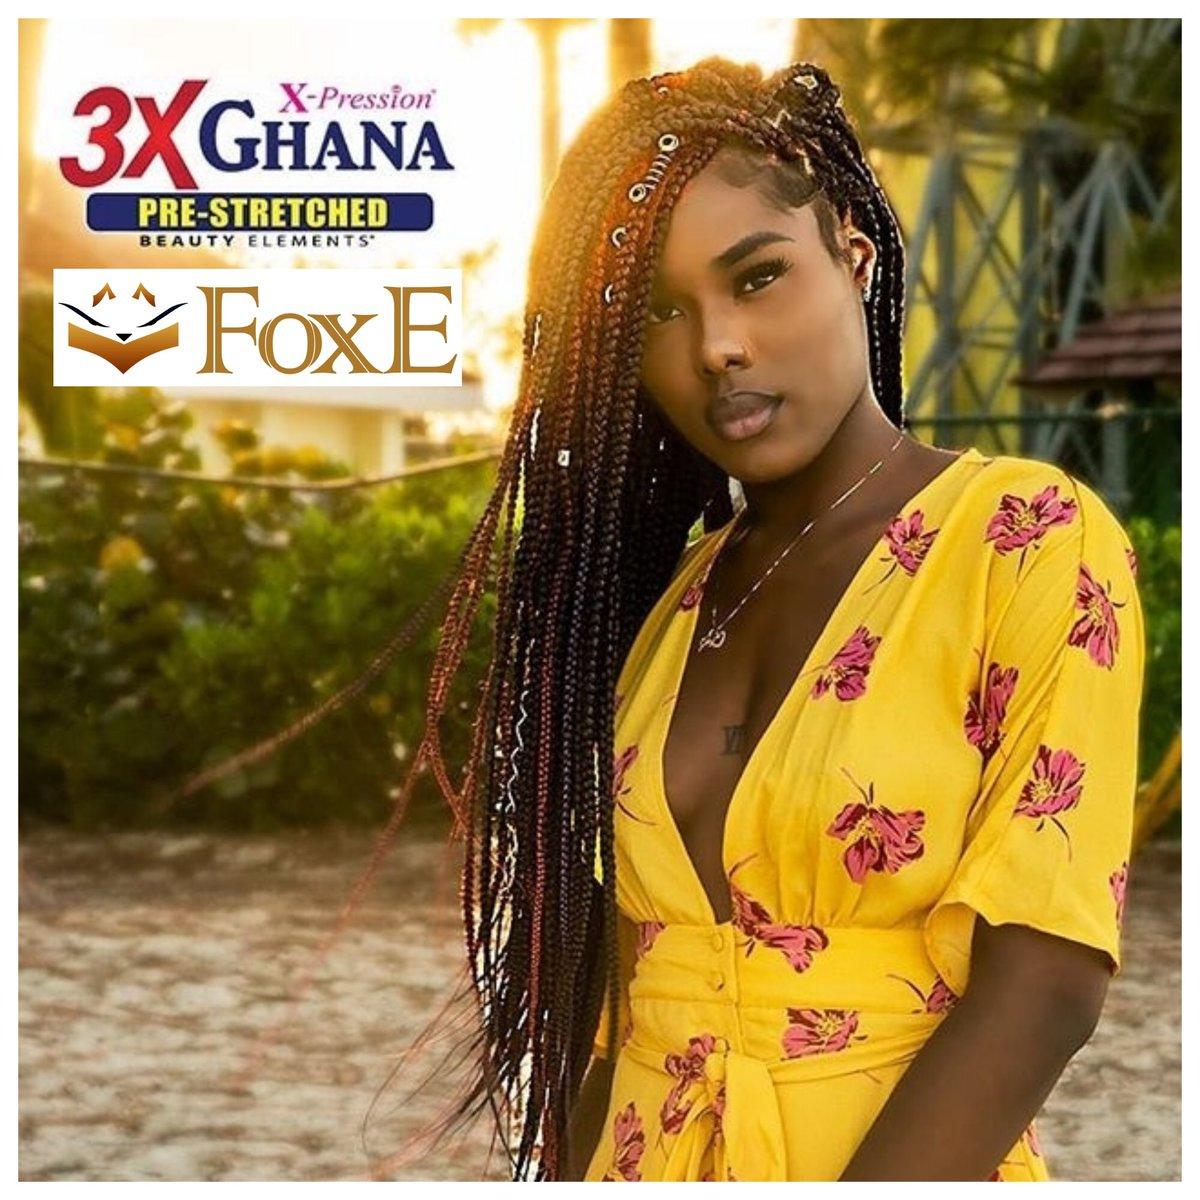 Foxe Jamaica On Twitter Realistic 3x Ghana Prestretched Braid In Length 50 By Bijoux Beauty Elements Create Unlimited Braid Hairstyles Finebraids Mediumbraids Shouldlengthbraids Braidhairstyles Hairblogger Hairinfluencer Braidblogger